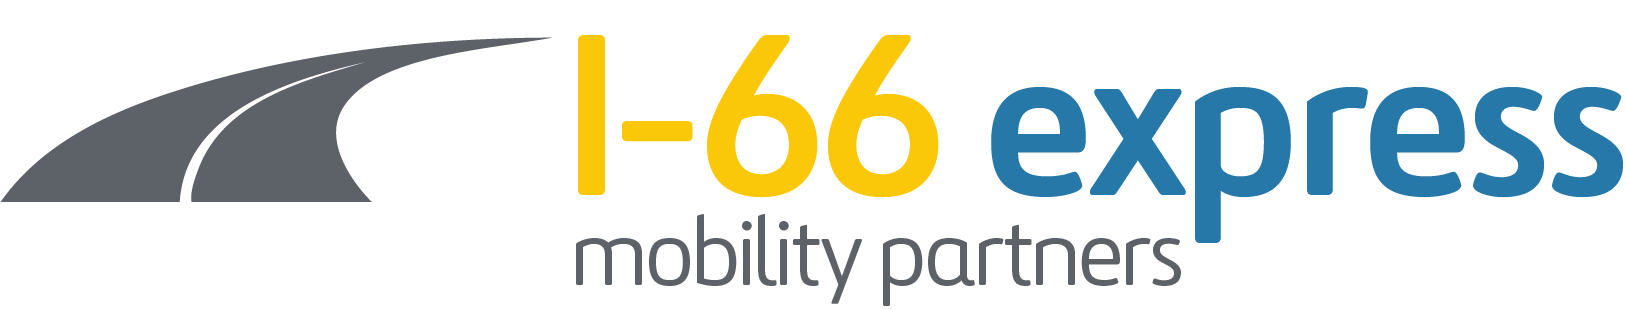 I-66 Express Mobility Partners Logo